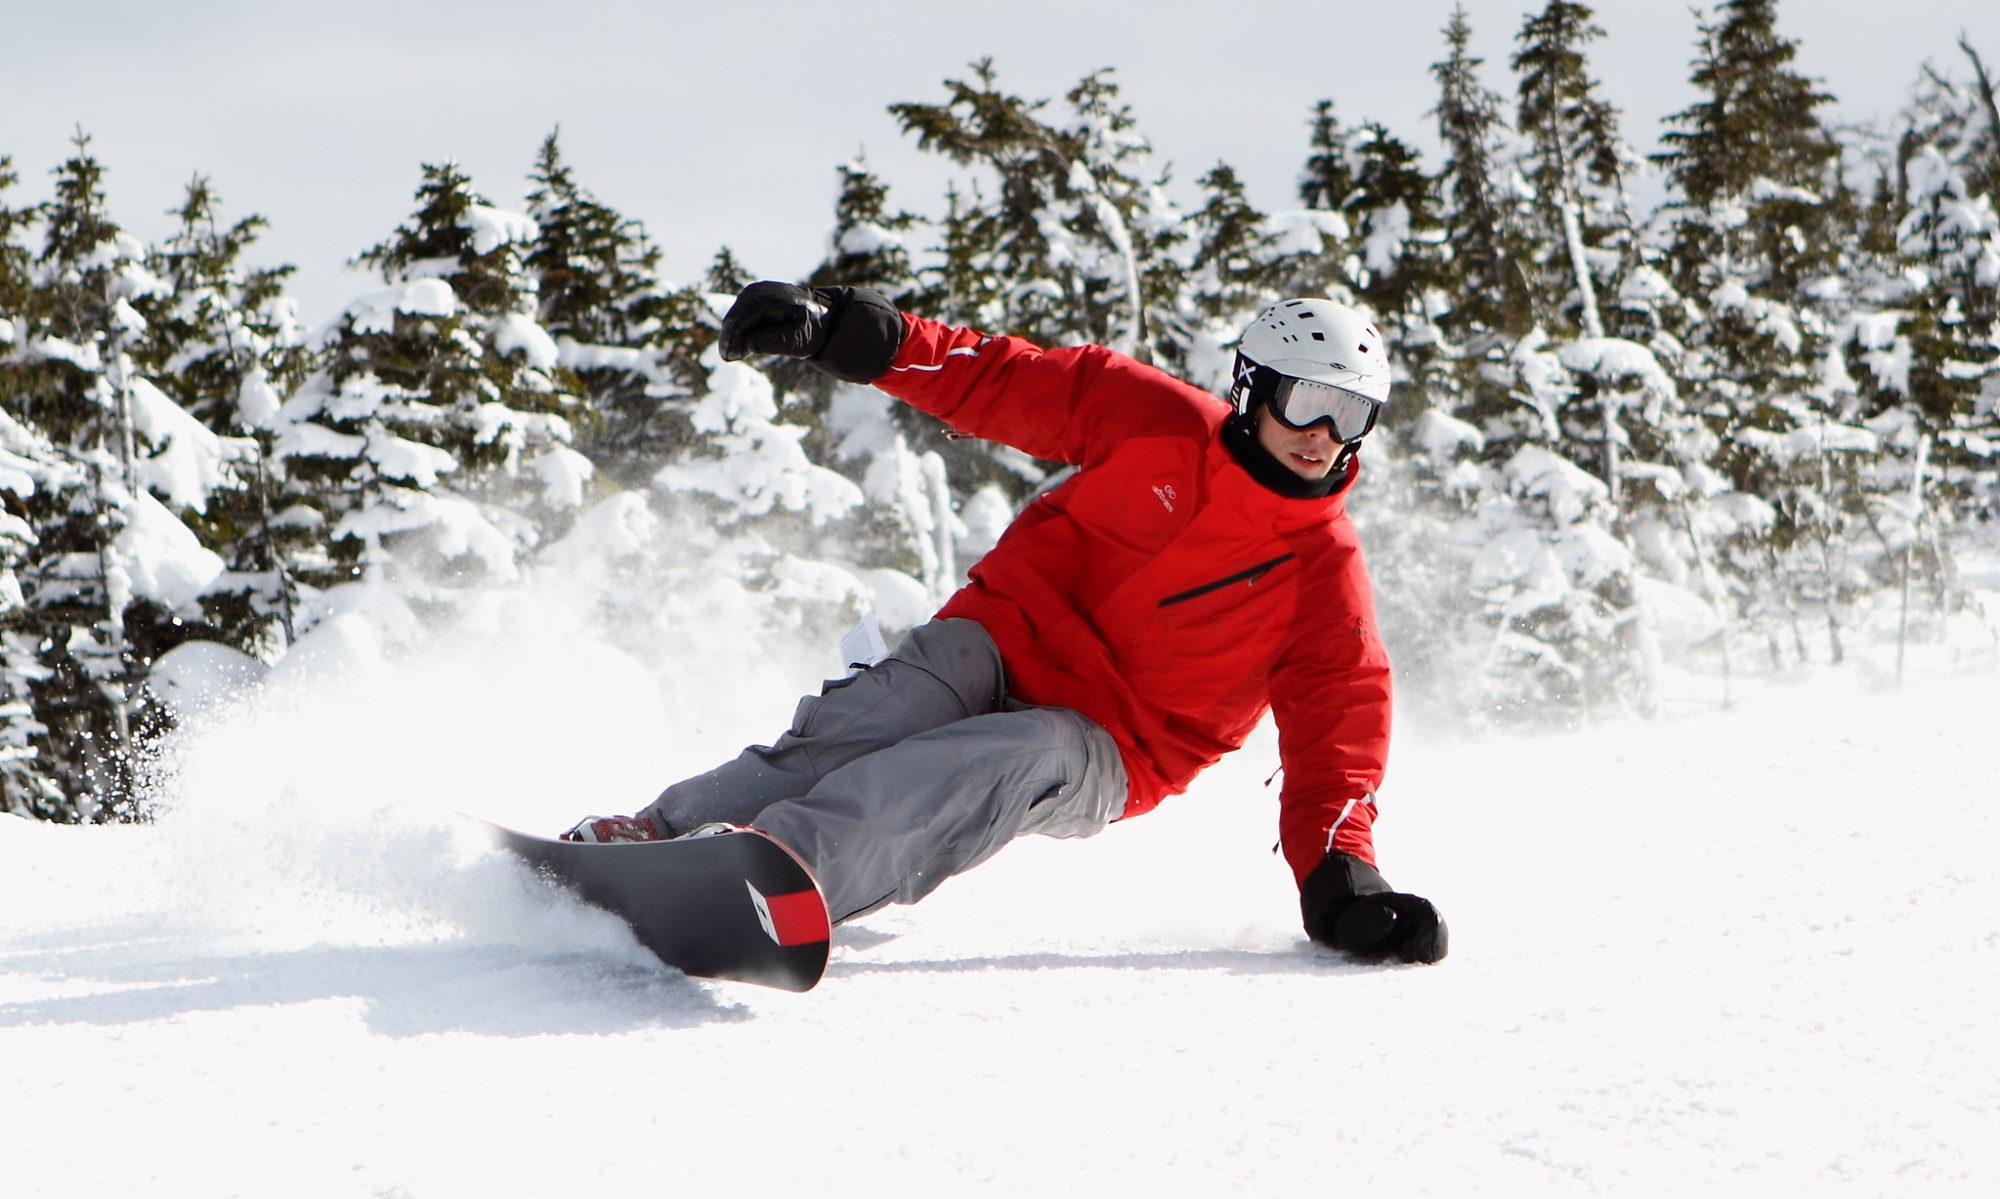 AlpineSnowboarder.com